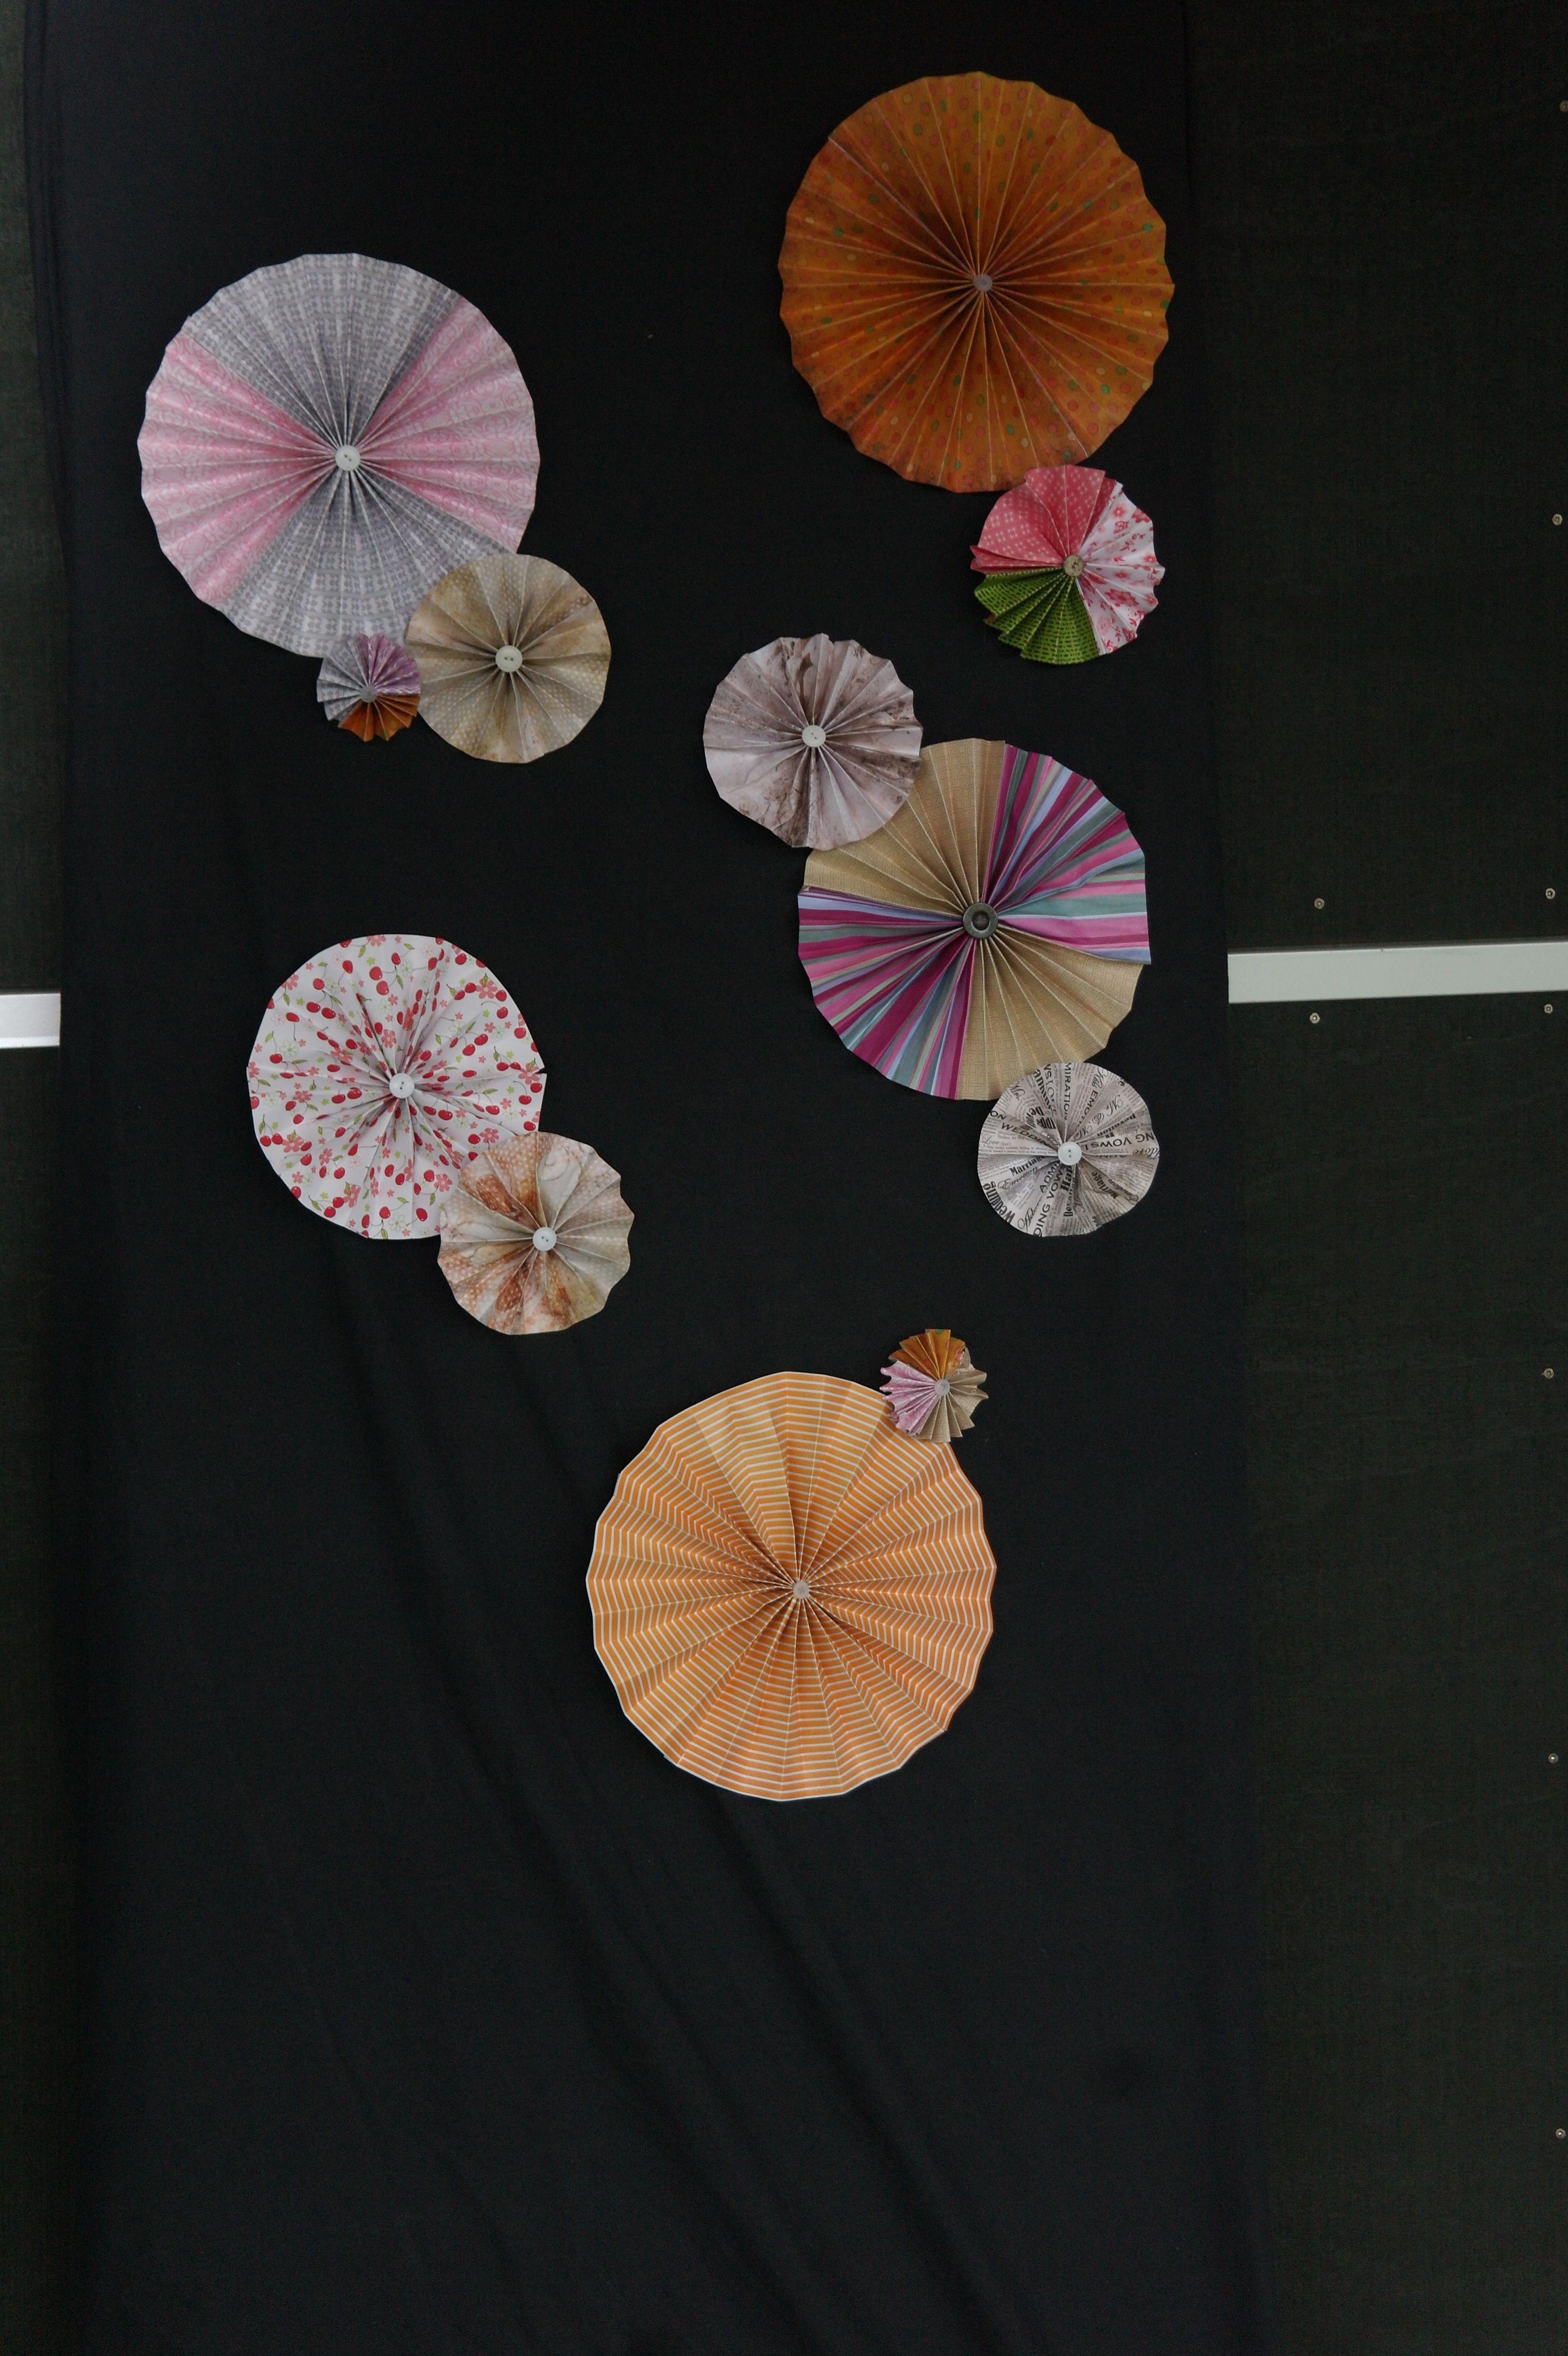 Pinwheel photo background